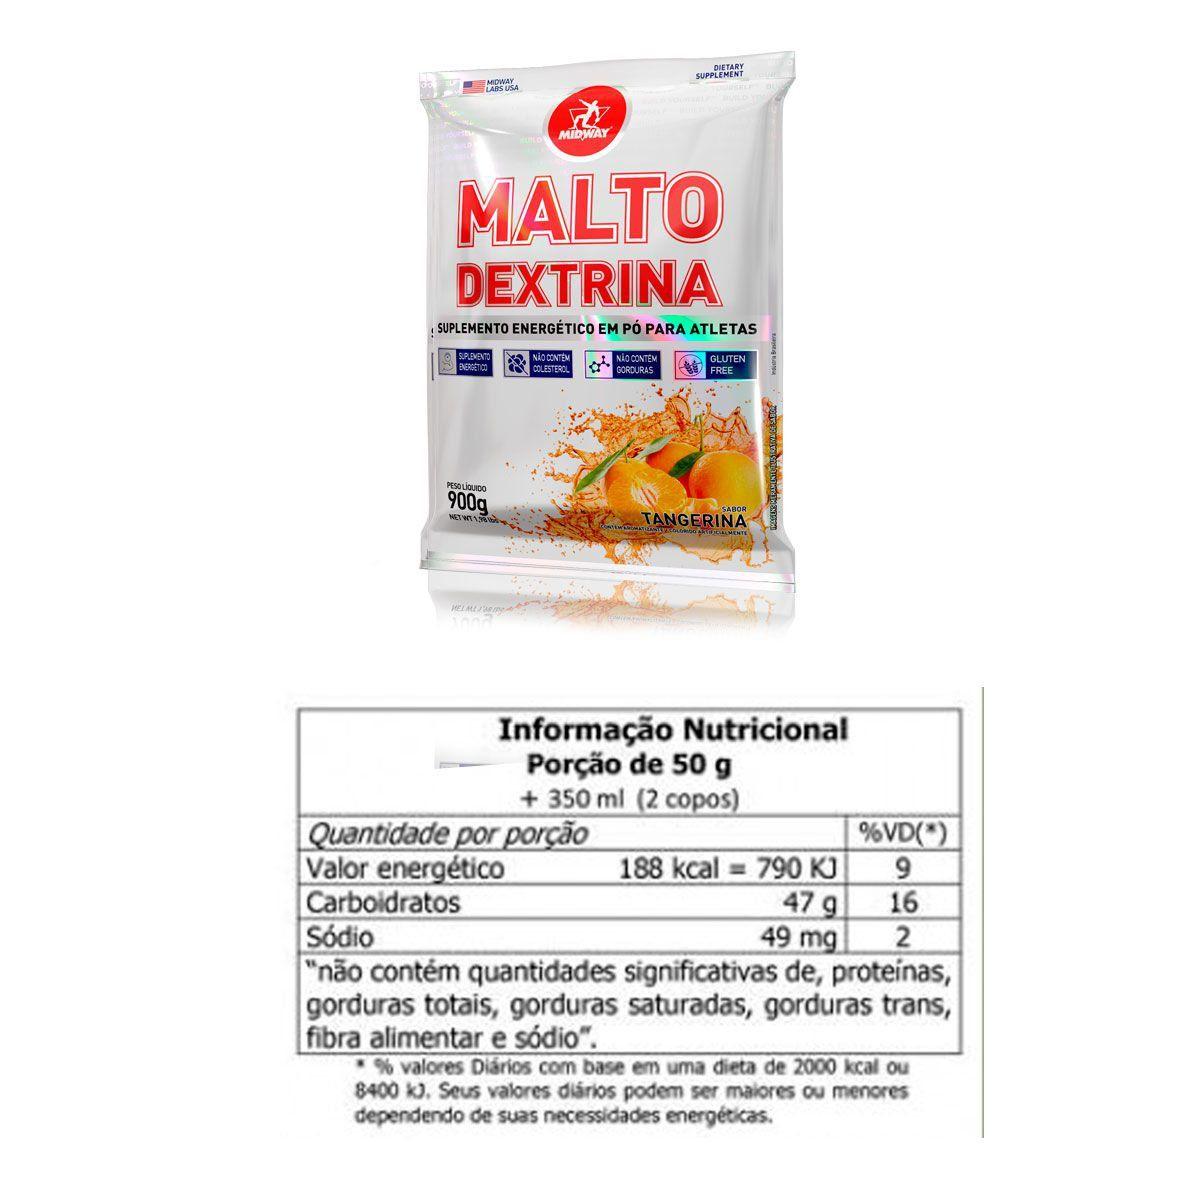 Maltodextrina USA 900g - Midway